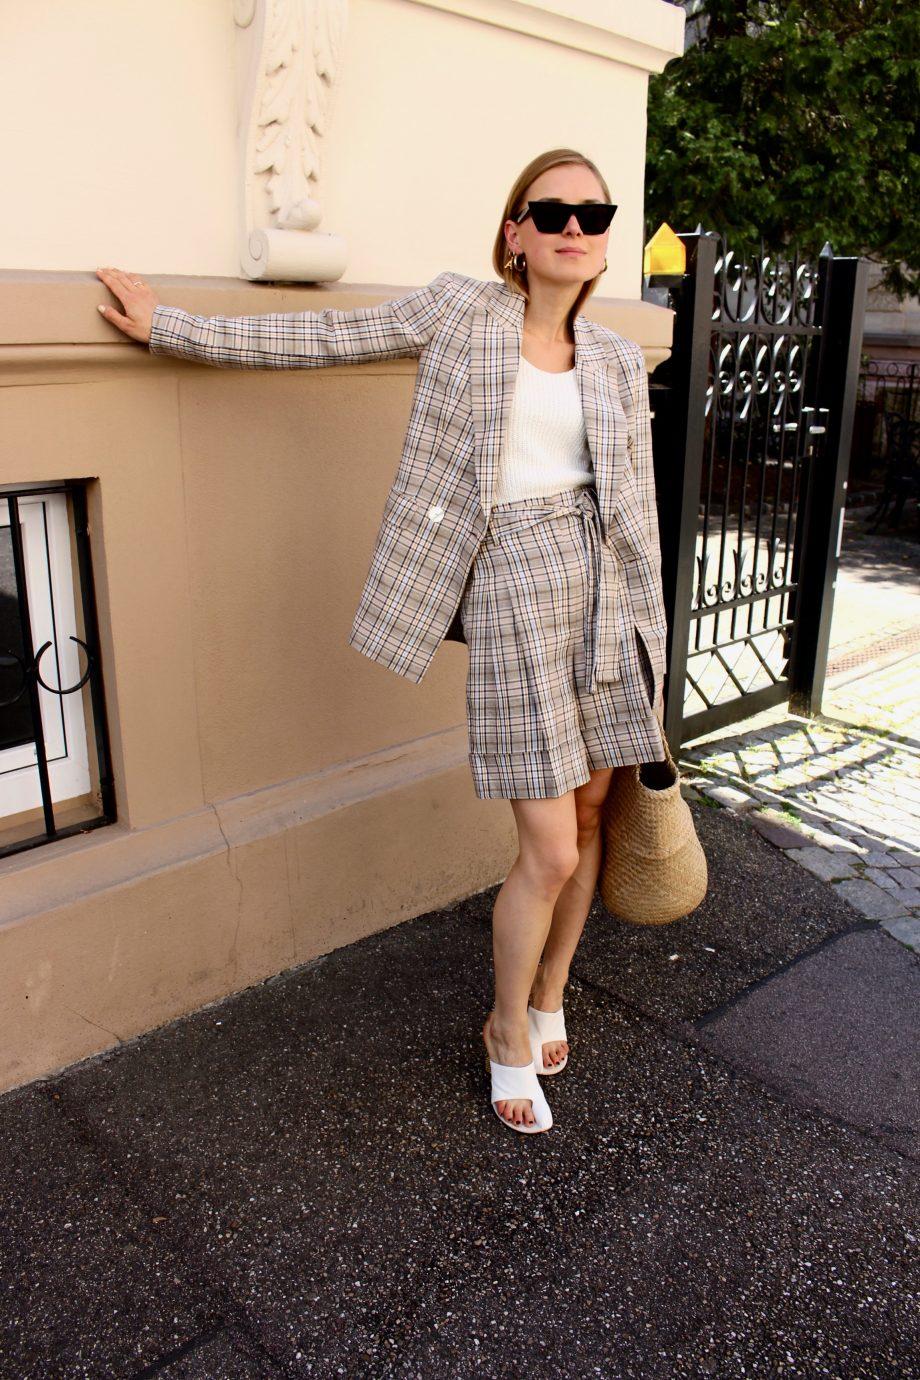 The Massimo Dutti Suit |04.07.2018